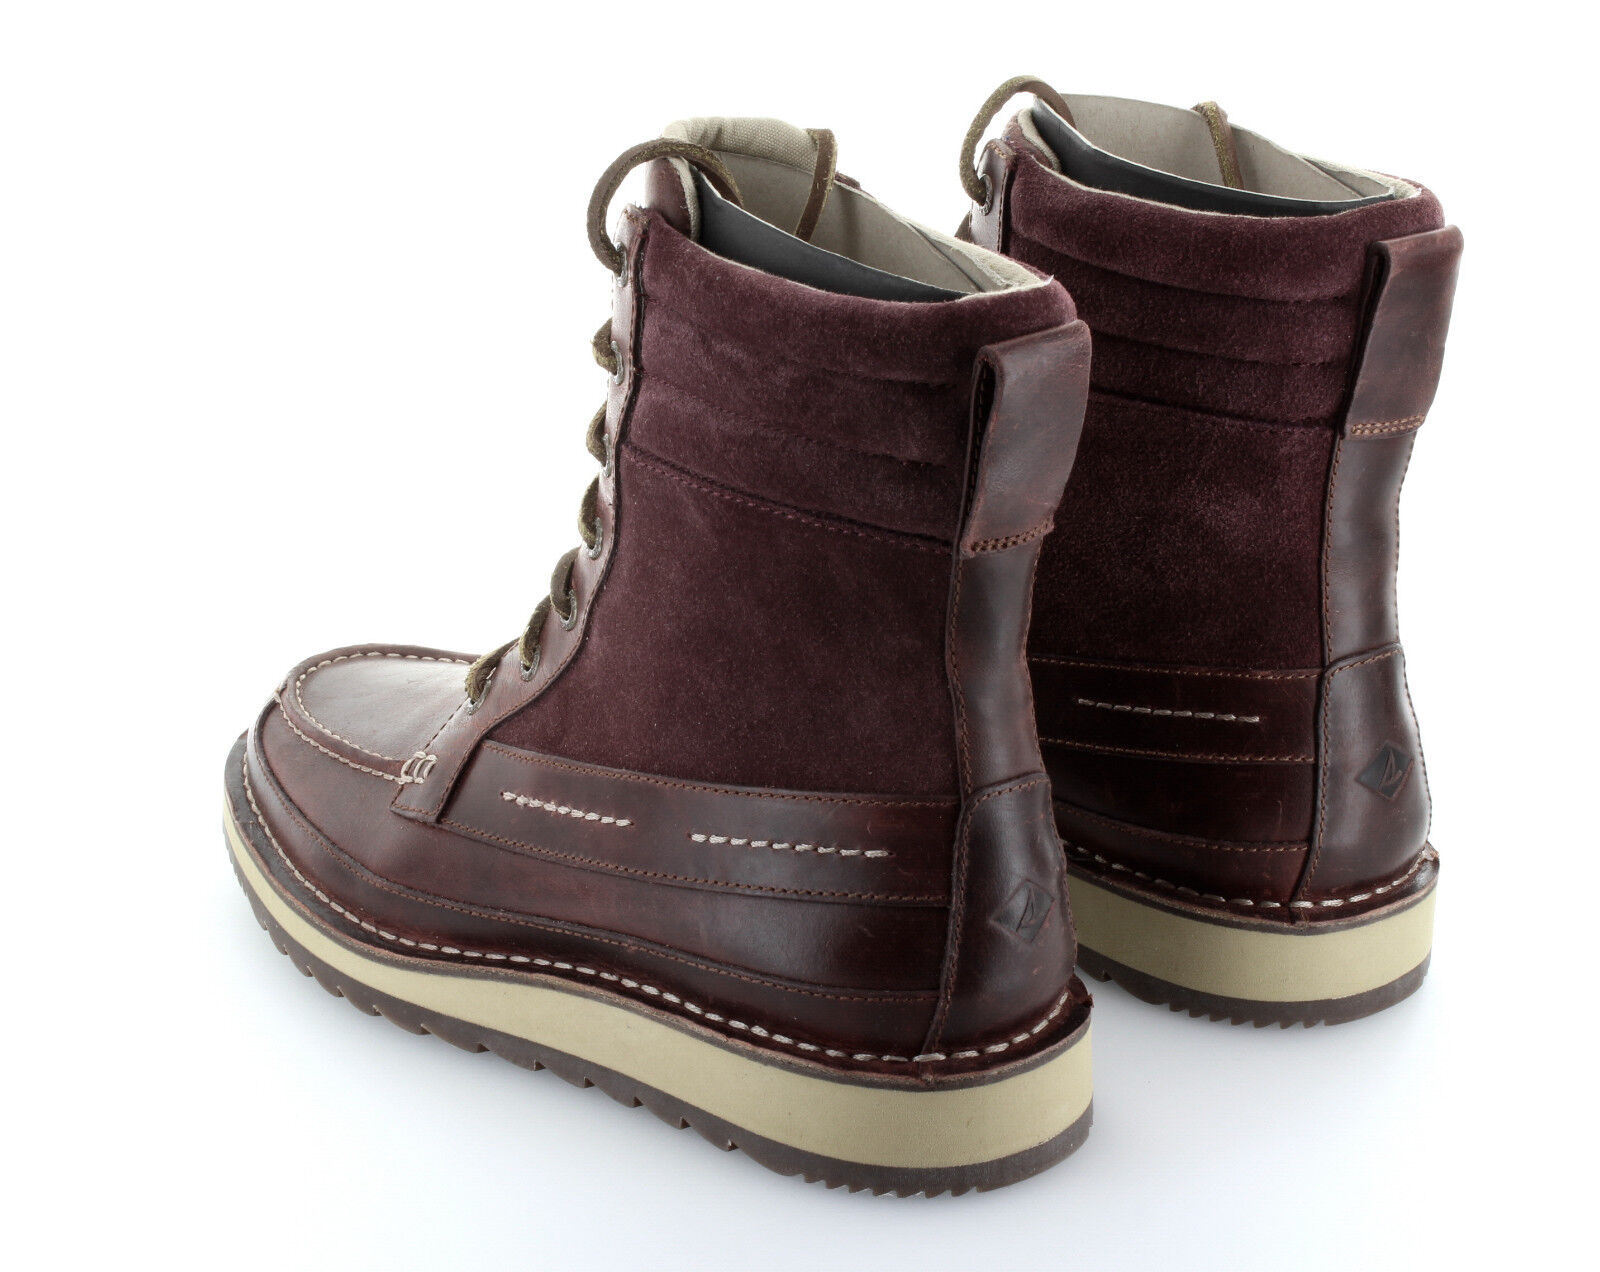 Sperry Top Sider Dockyard Boot Oxblood Stiefel Leder Schuhe Gr. 42 / US 9